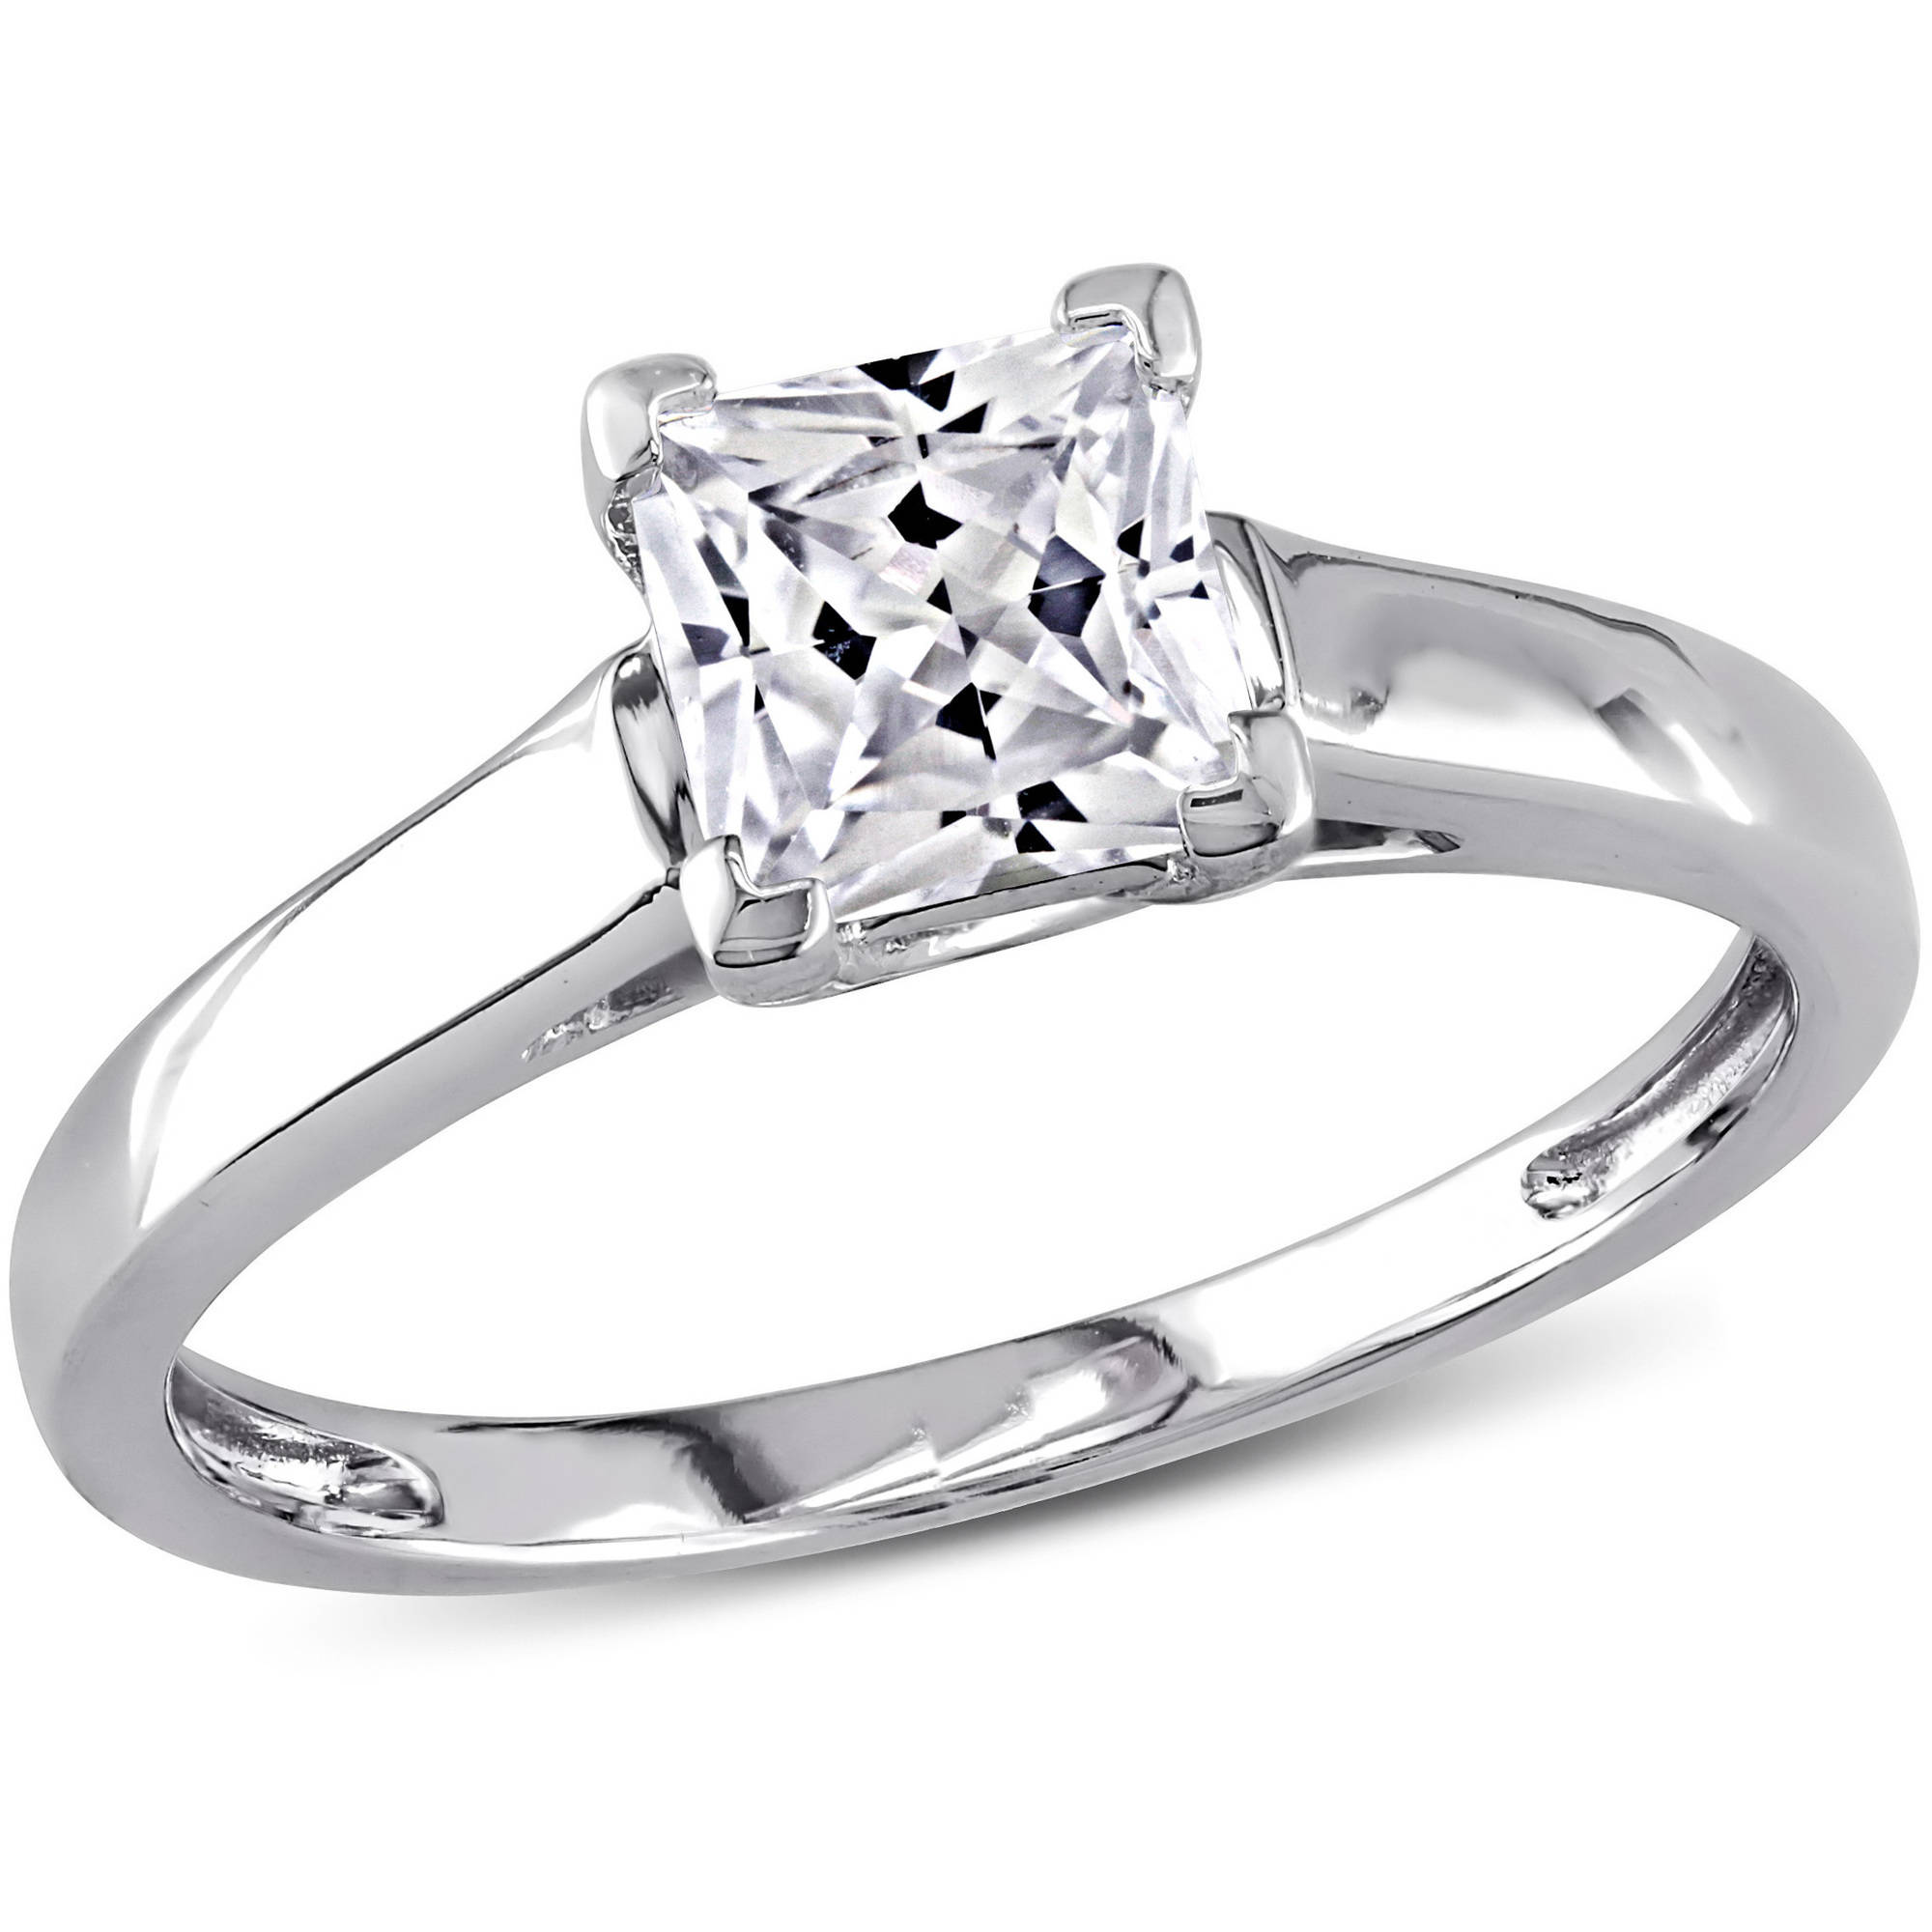 miabella 1 carat t g w princess cut created white